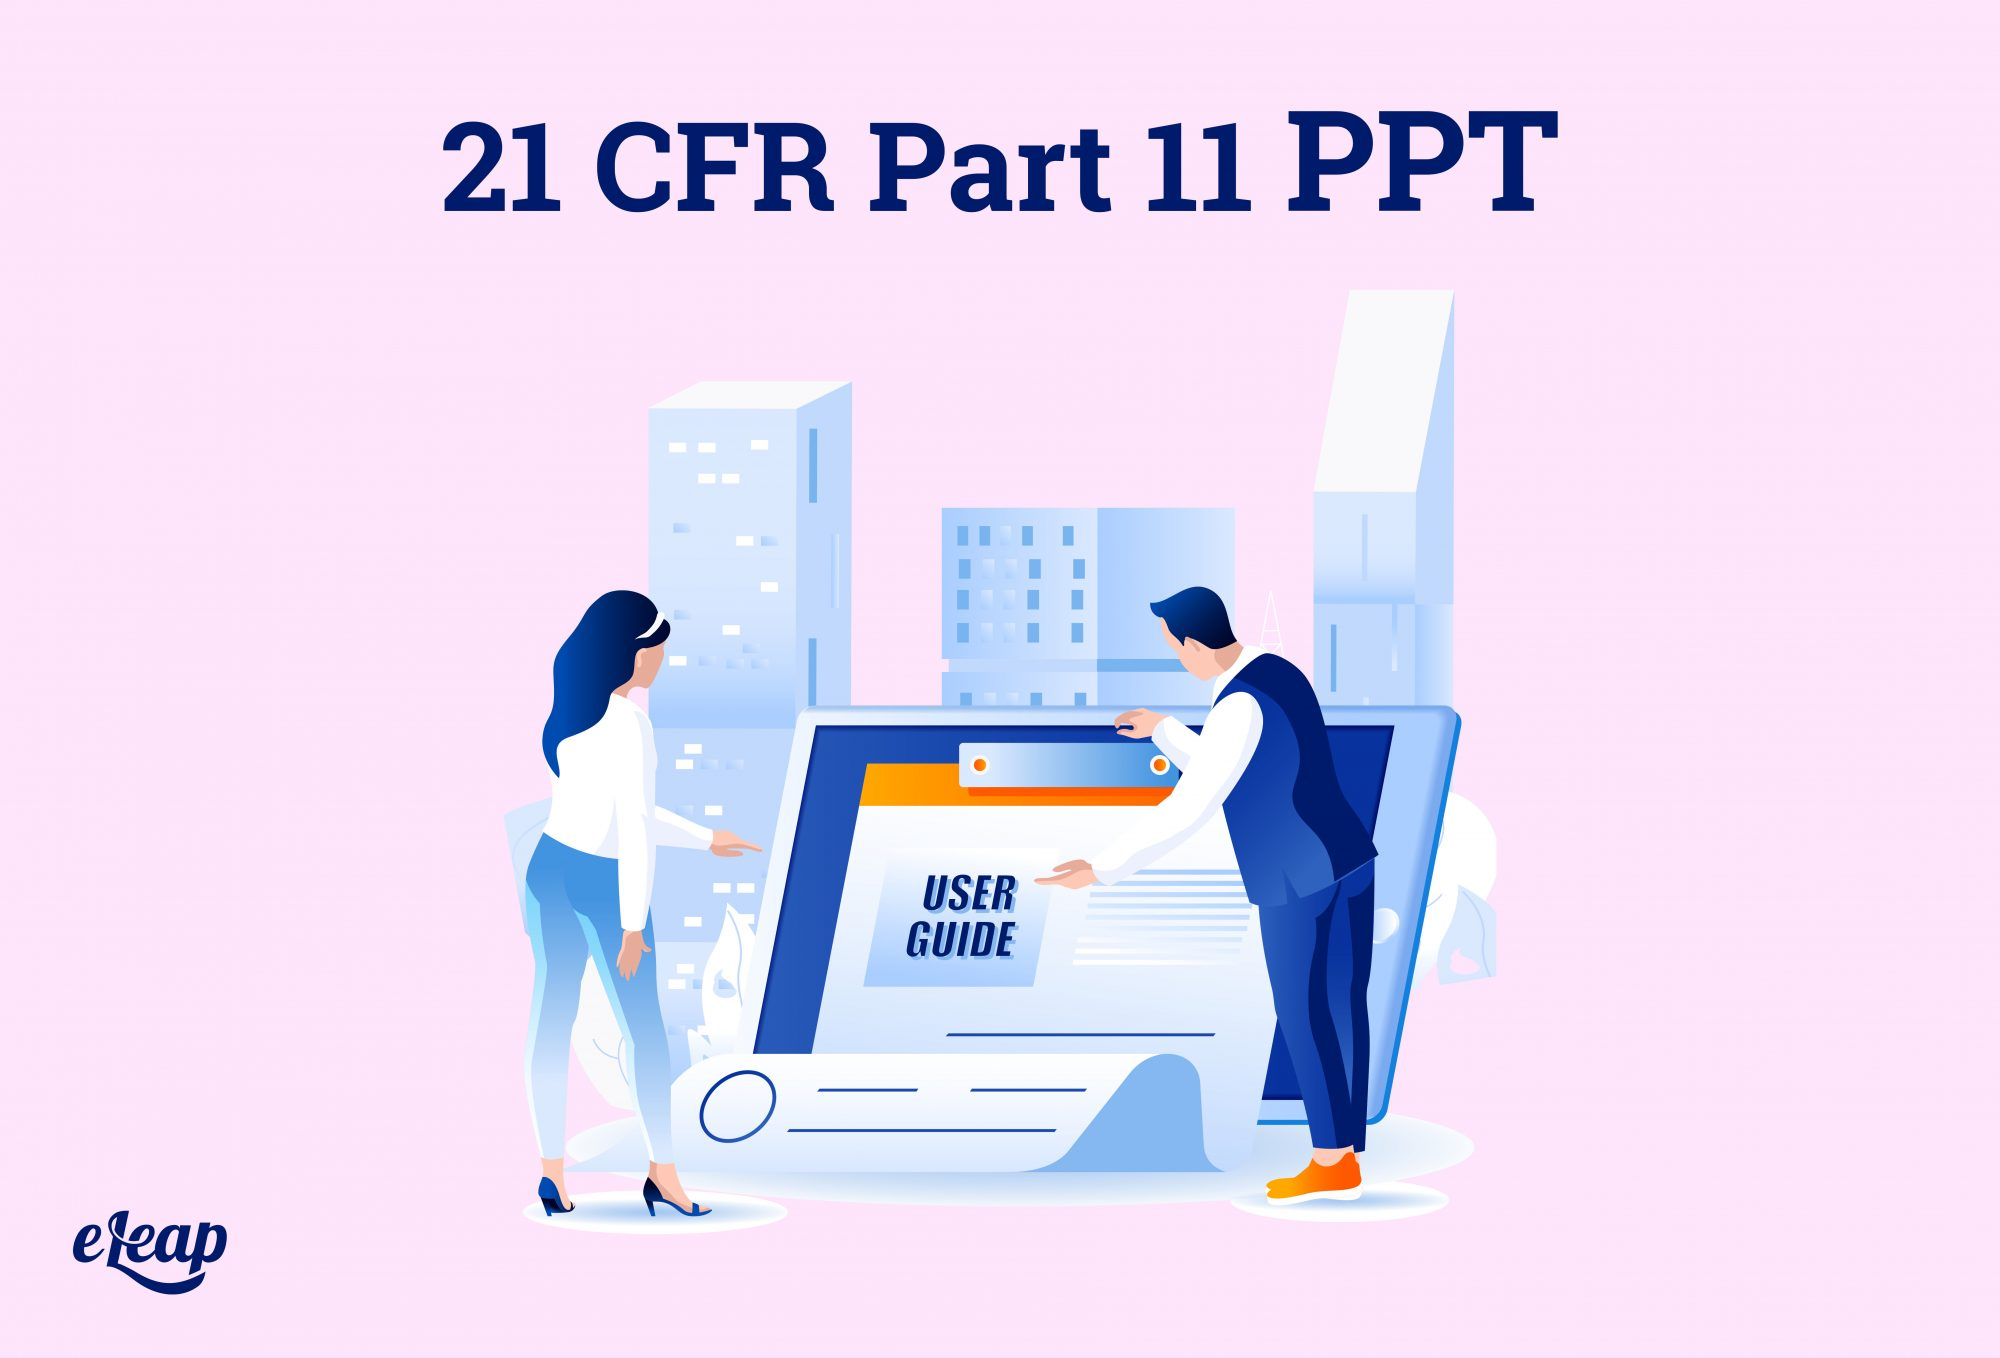 21 CFR Part 11 PPT